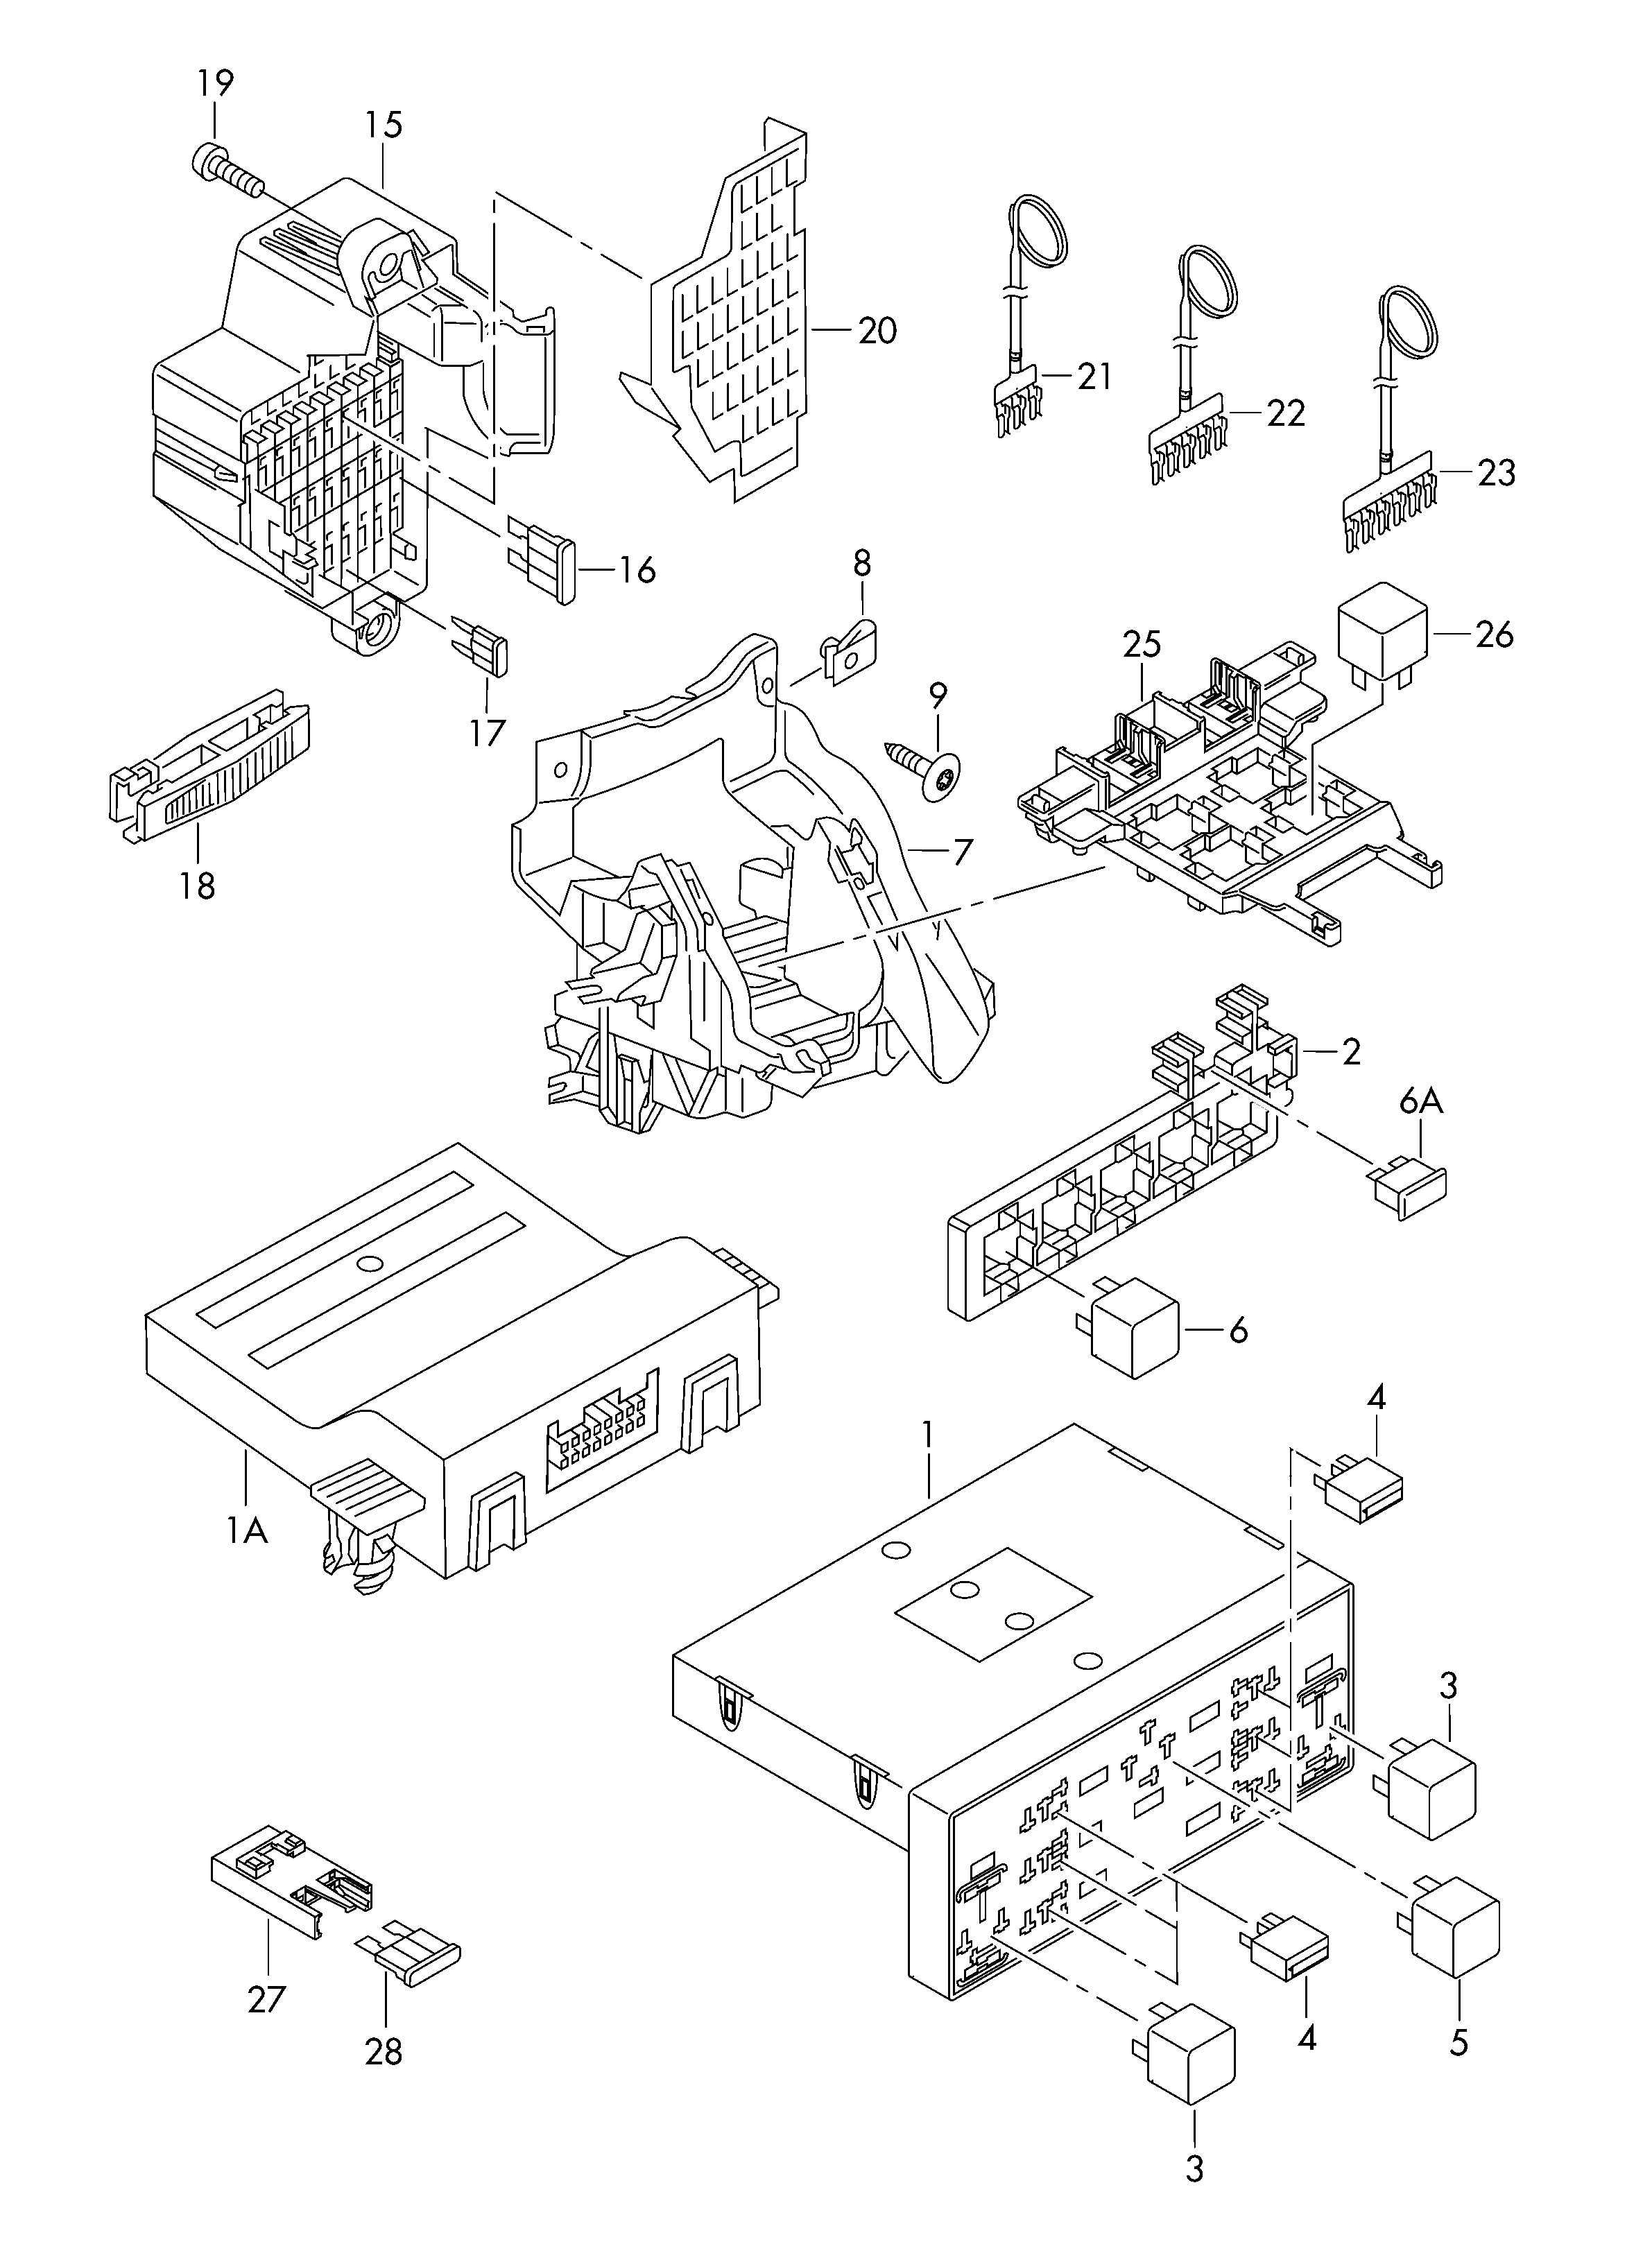 Volkswagen Passat/Variant (2006 - 2007) / VAG Etka